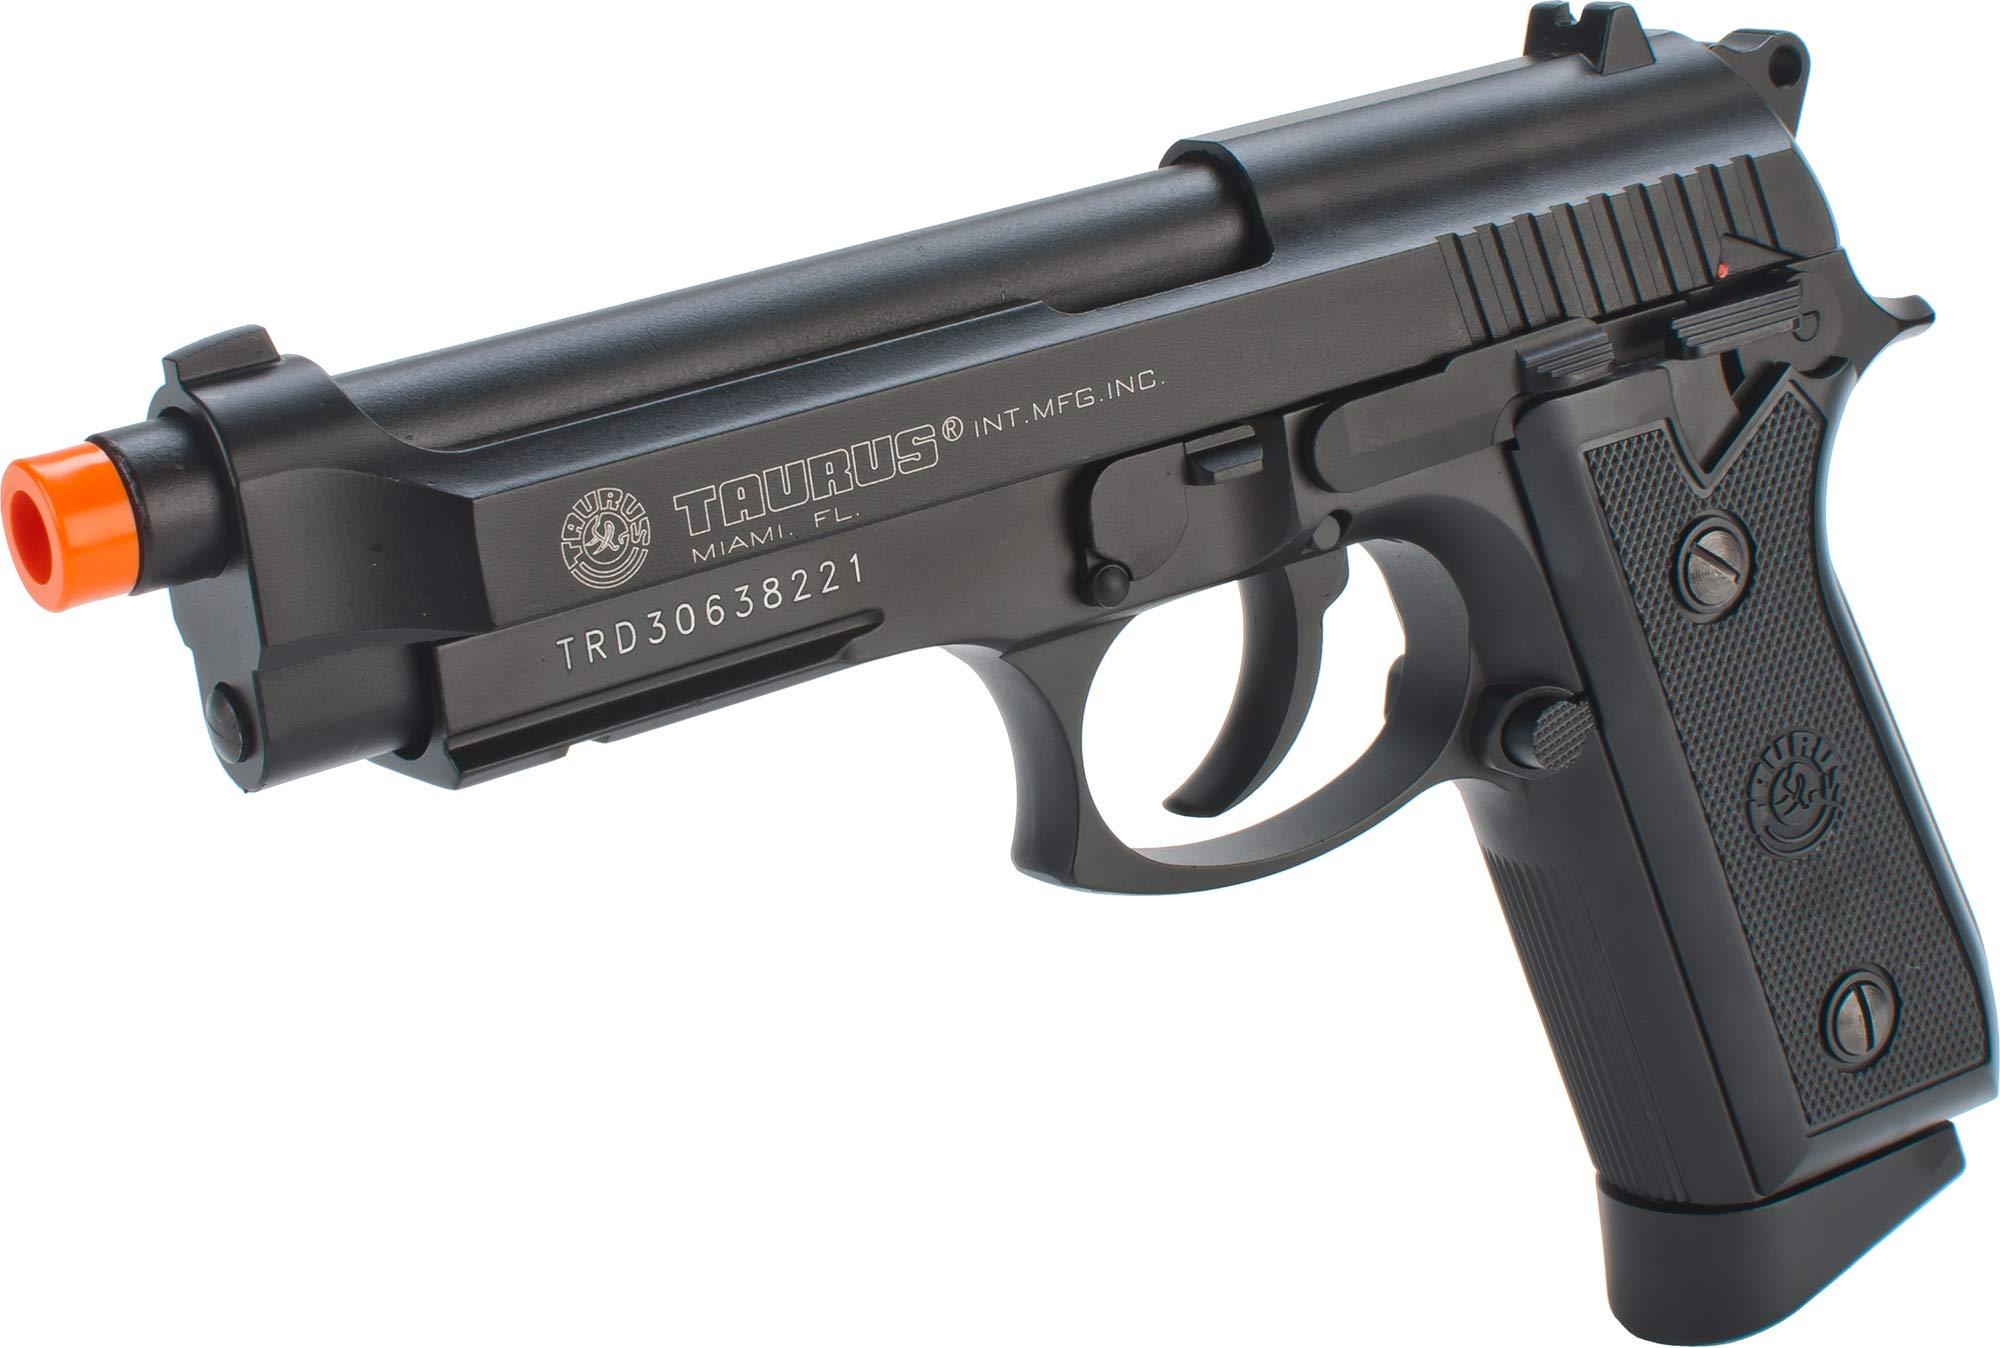 Soft Air PT99 Taurus Co2 Full Auto Metal Blowback Pistol by Taurus